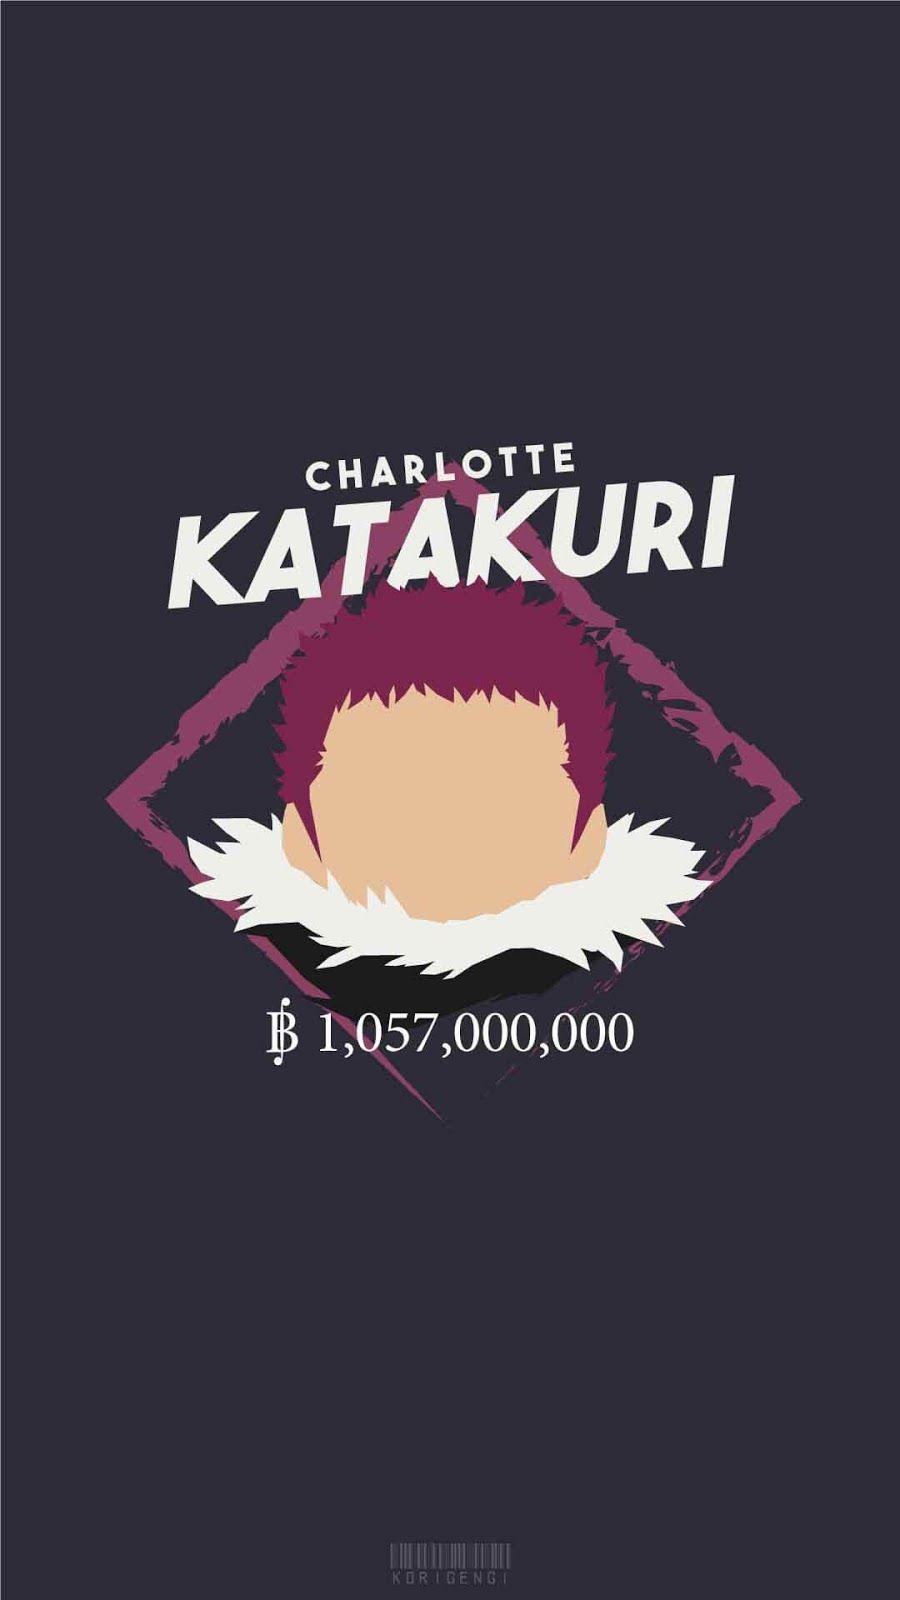 Charlotte Katakuri - One Piece Wallpaper